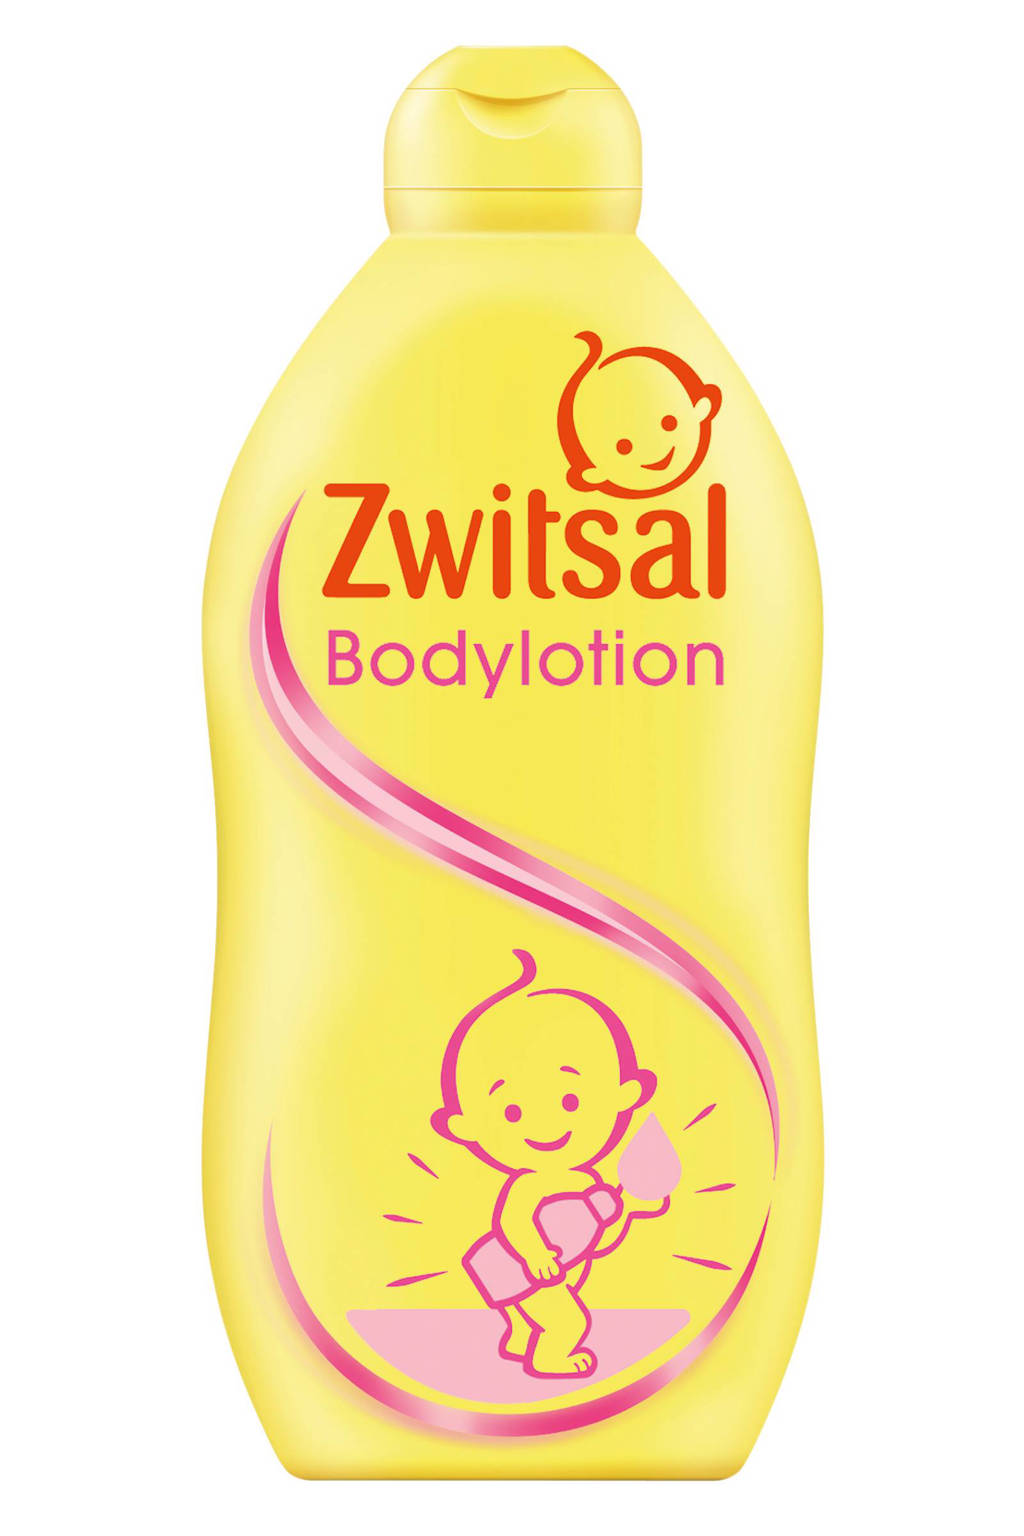 Zwitsal bodylotion - 400 ml - baby